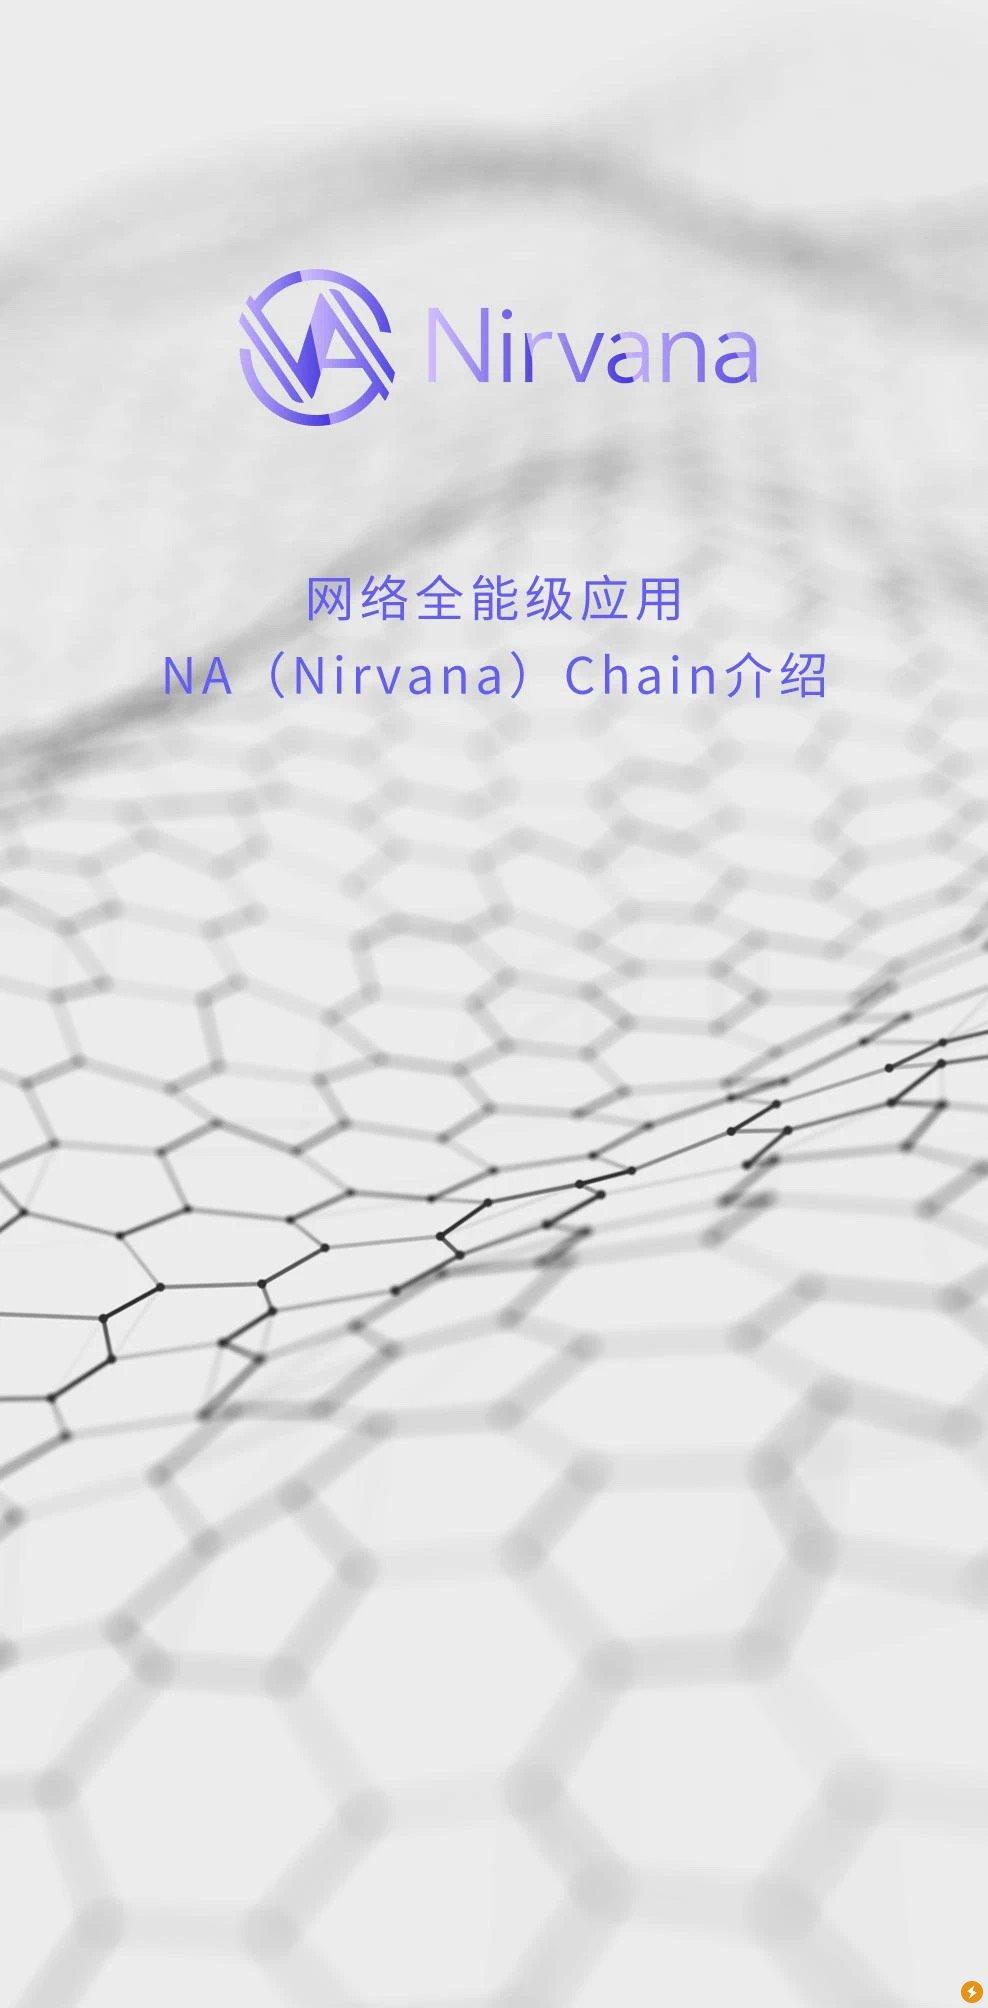 Nirvana Chain 全局简介 | 一文了解 NA(Nirvana)Chain